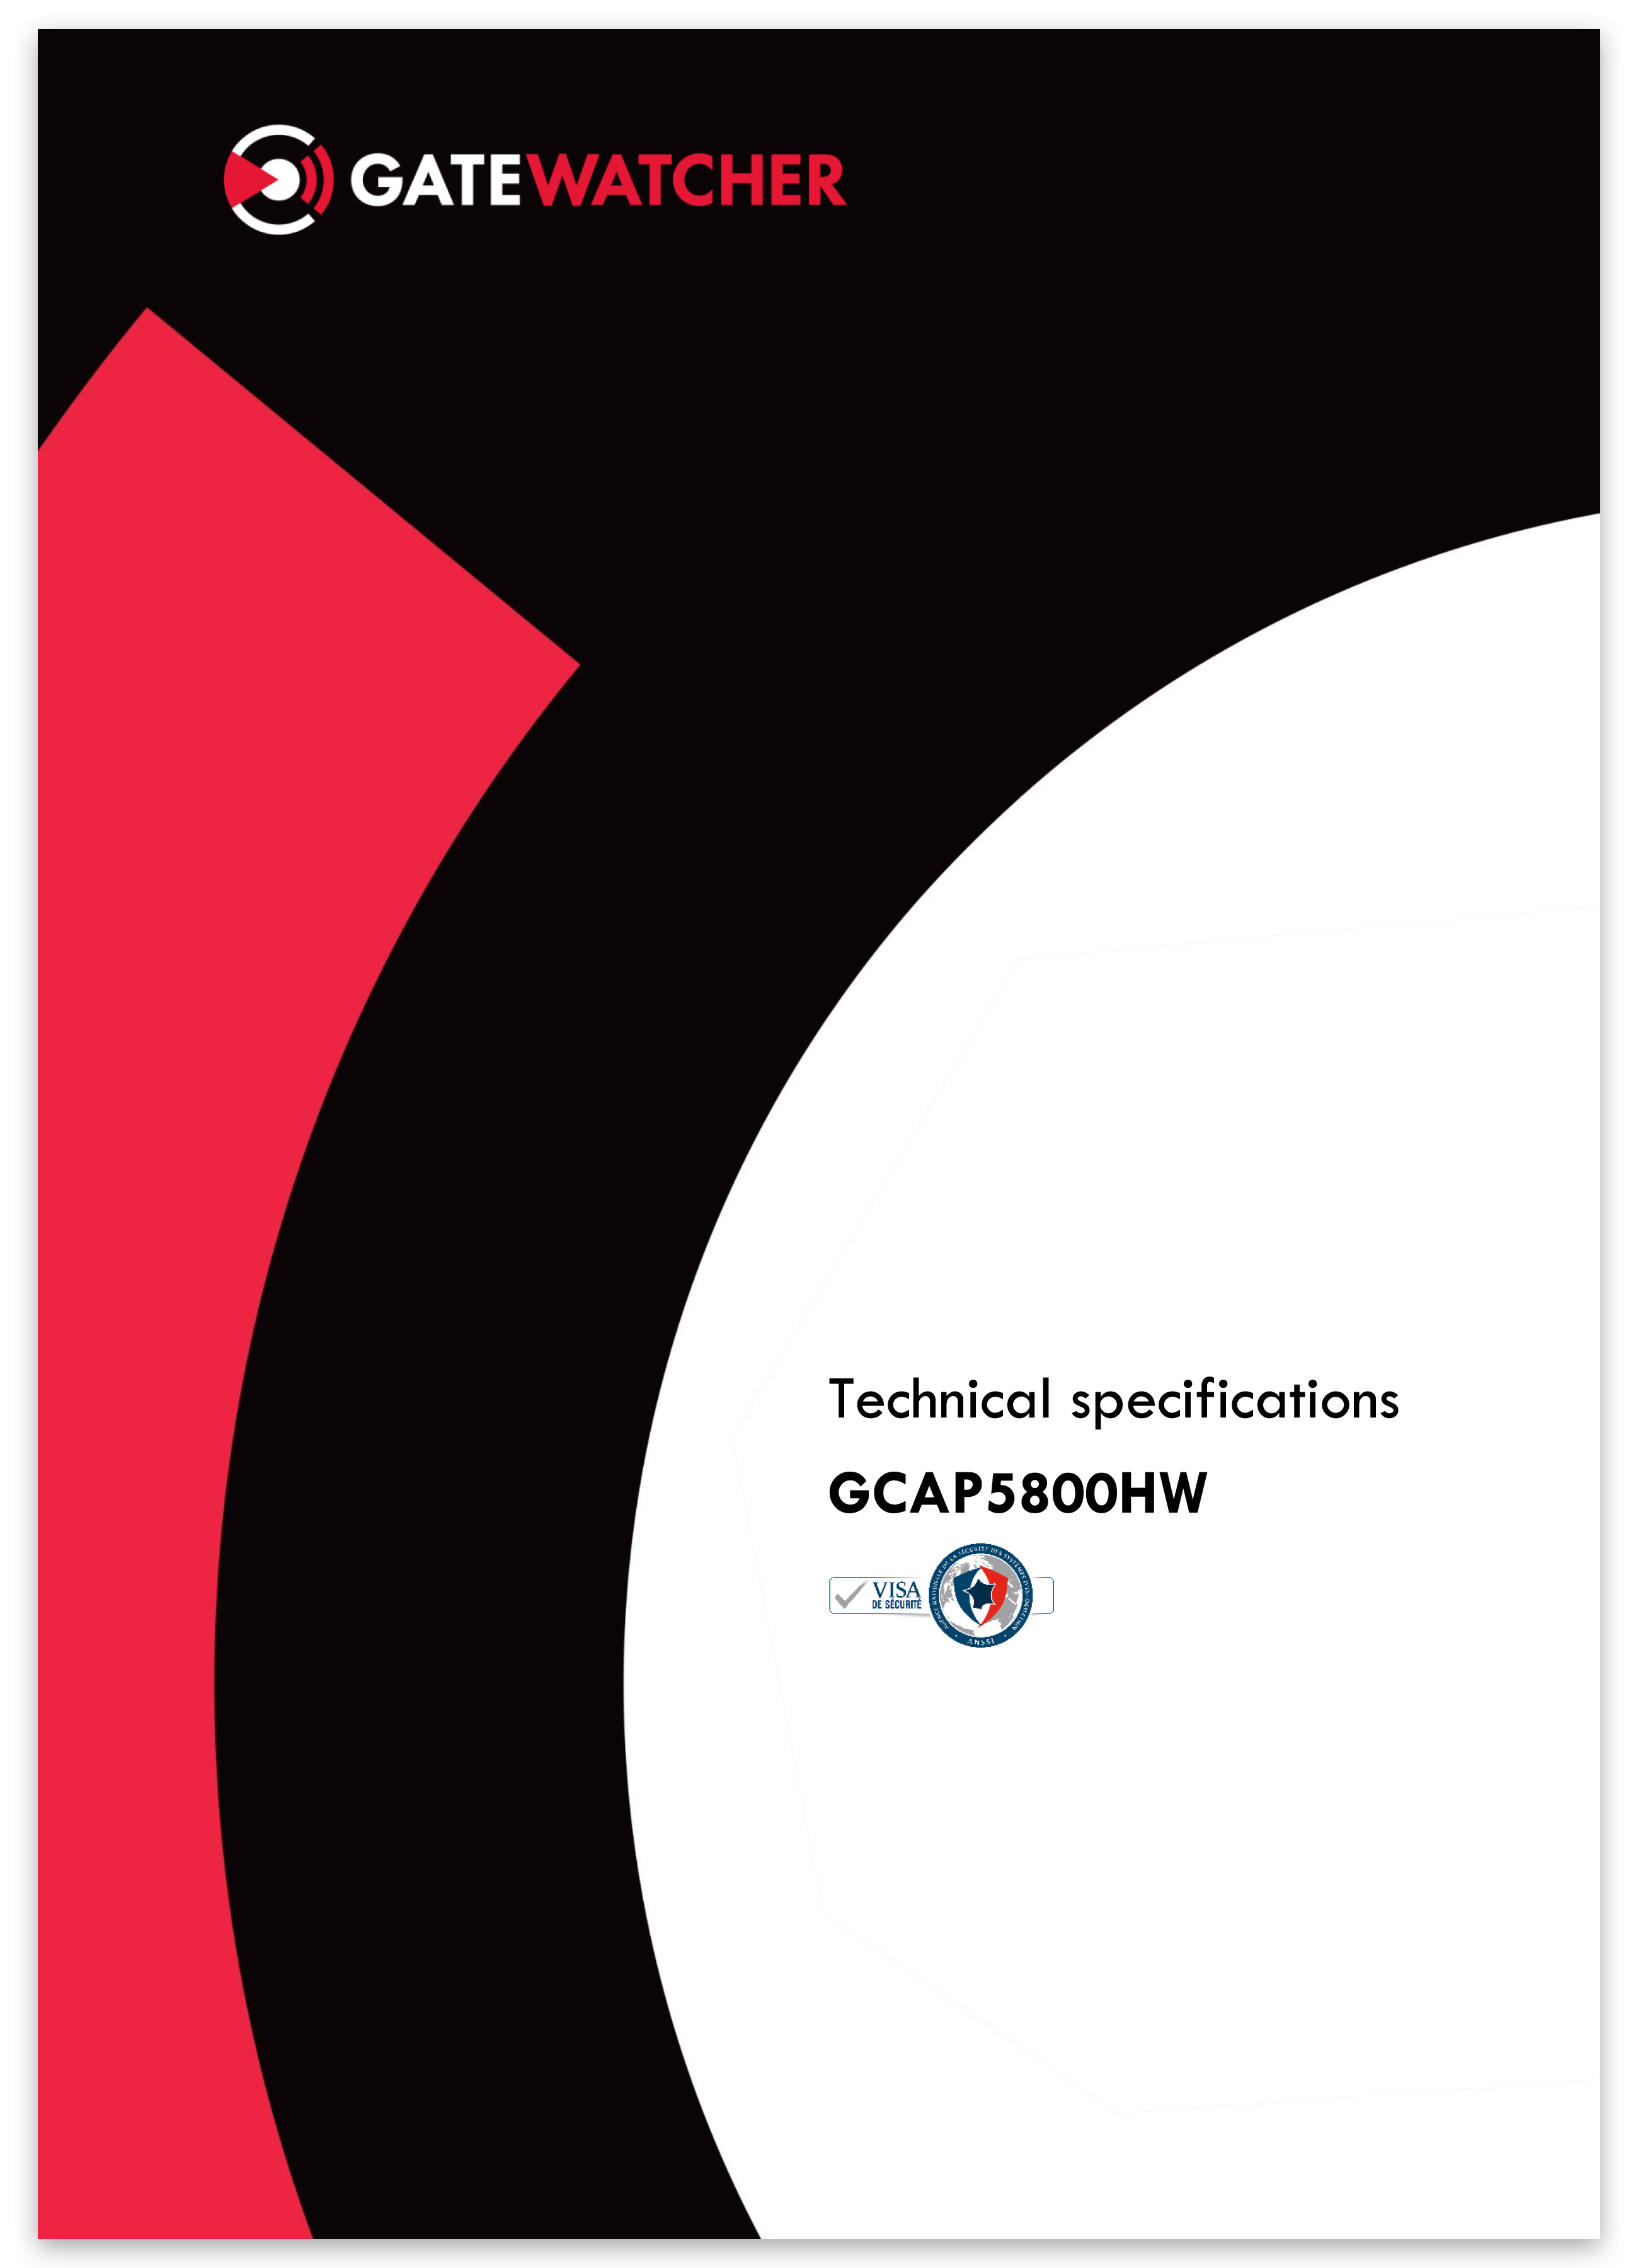 Gatewatcher GCAP5800HW EN